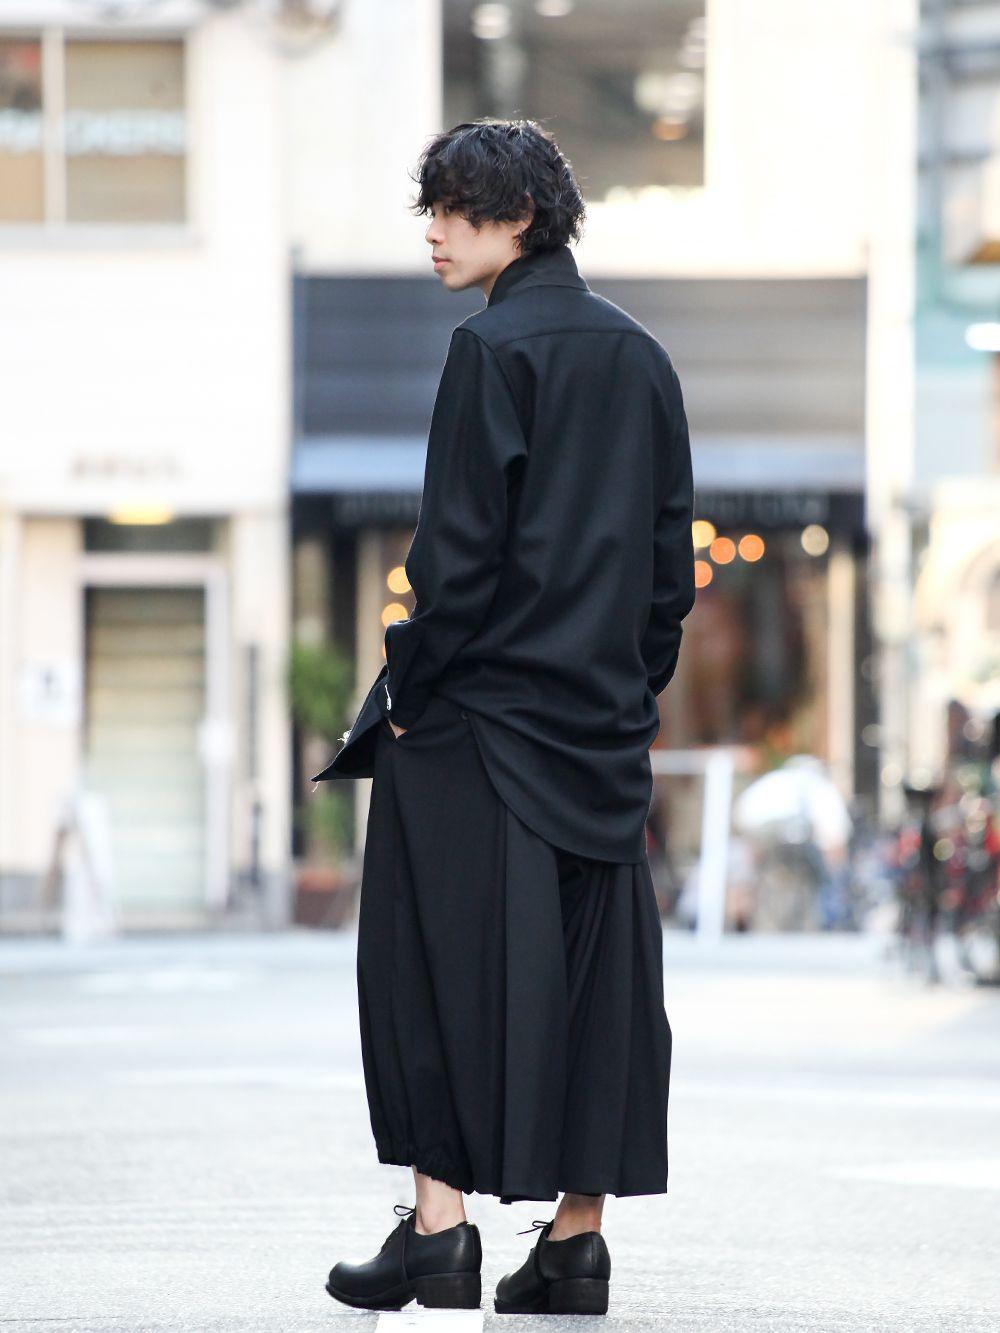 Yohji Yamamoto 19-20AW collection New Arrivals!! - 1-003